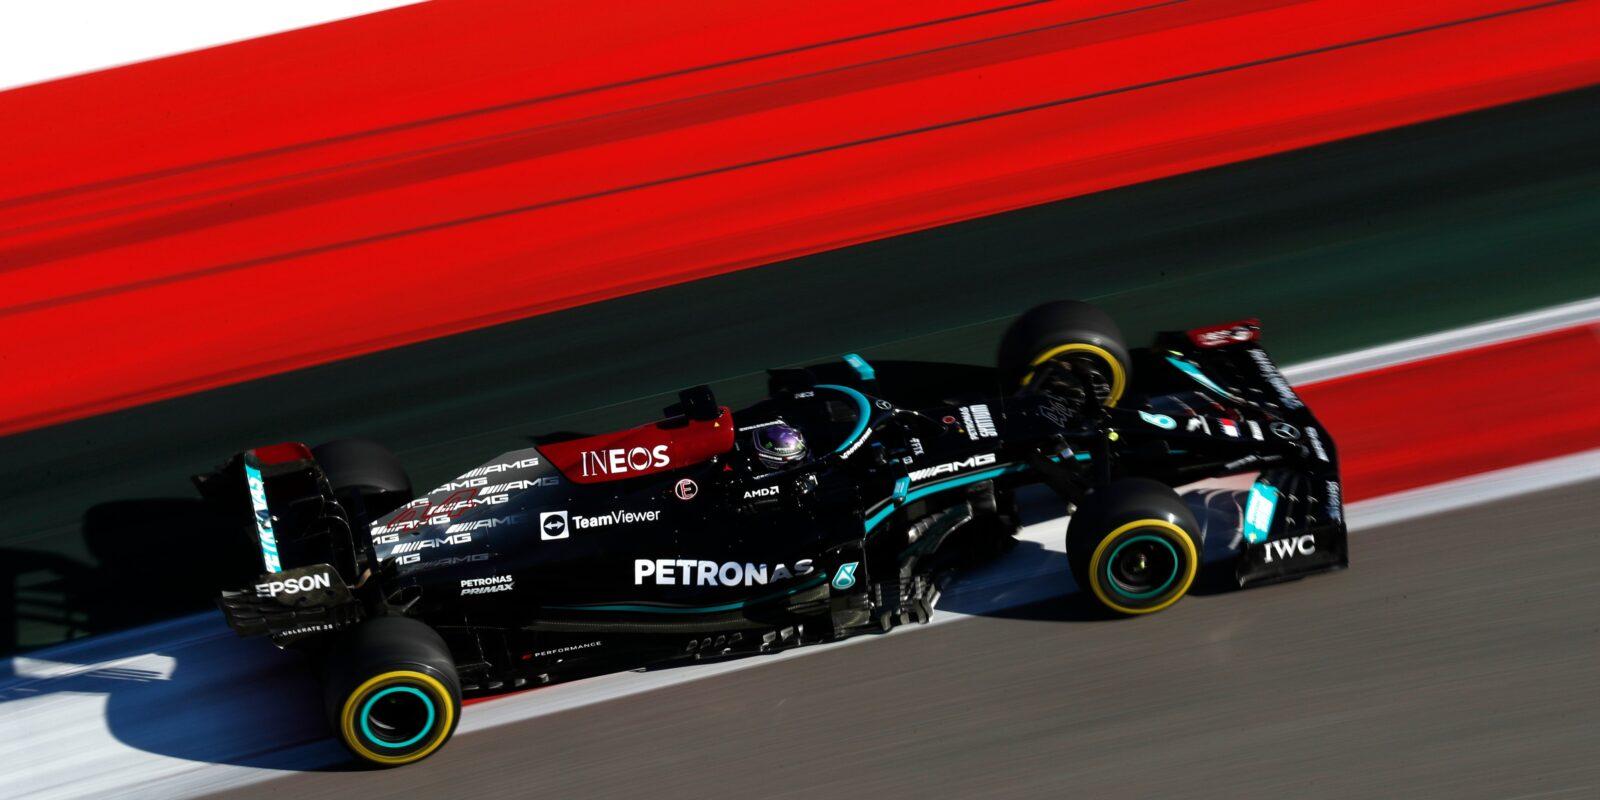 Drama v Soči nejlépe zvládl Hamilton. Verstappen druhý!